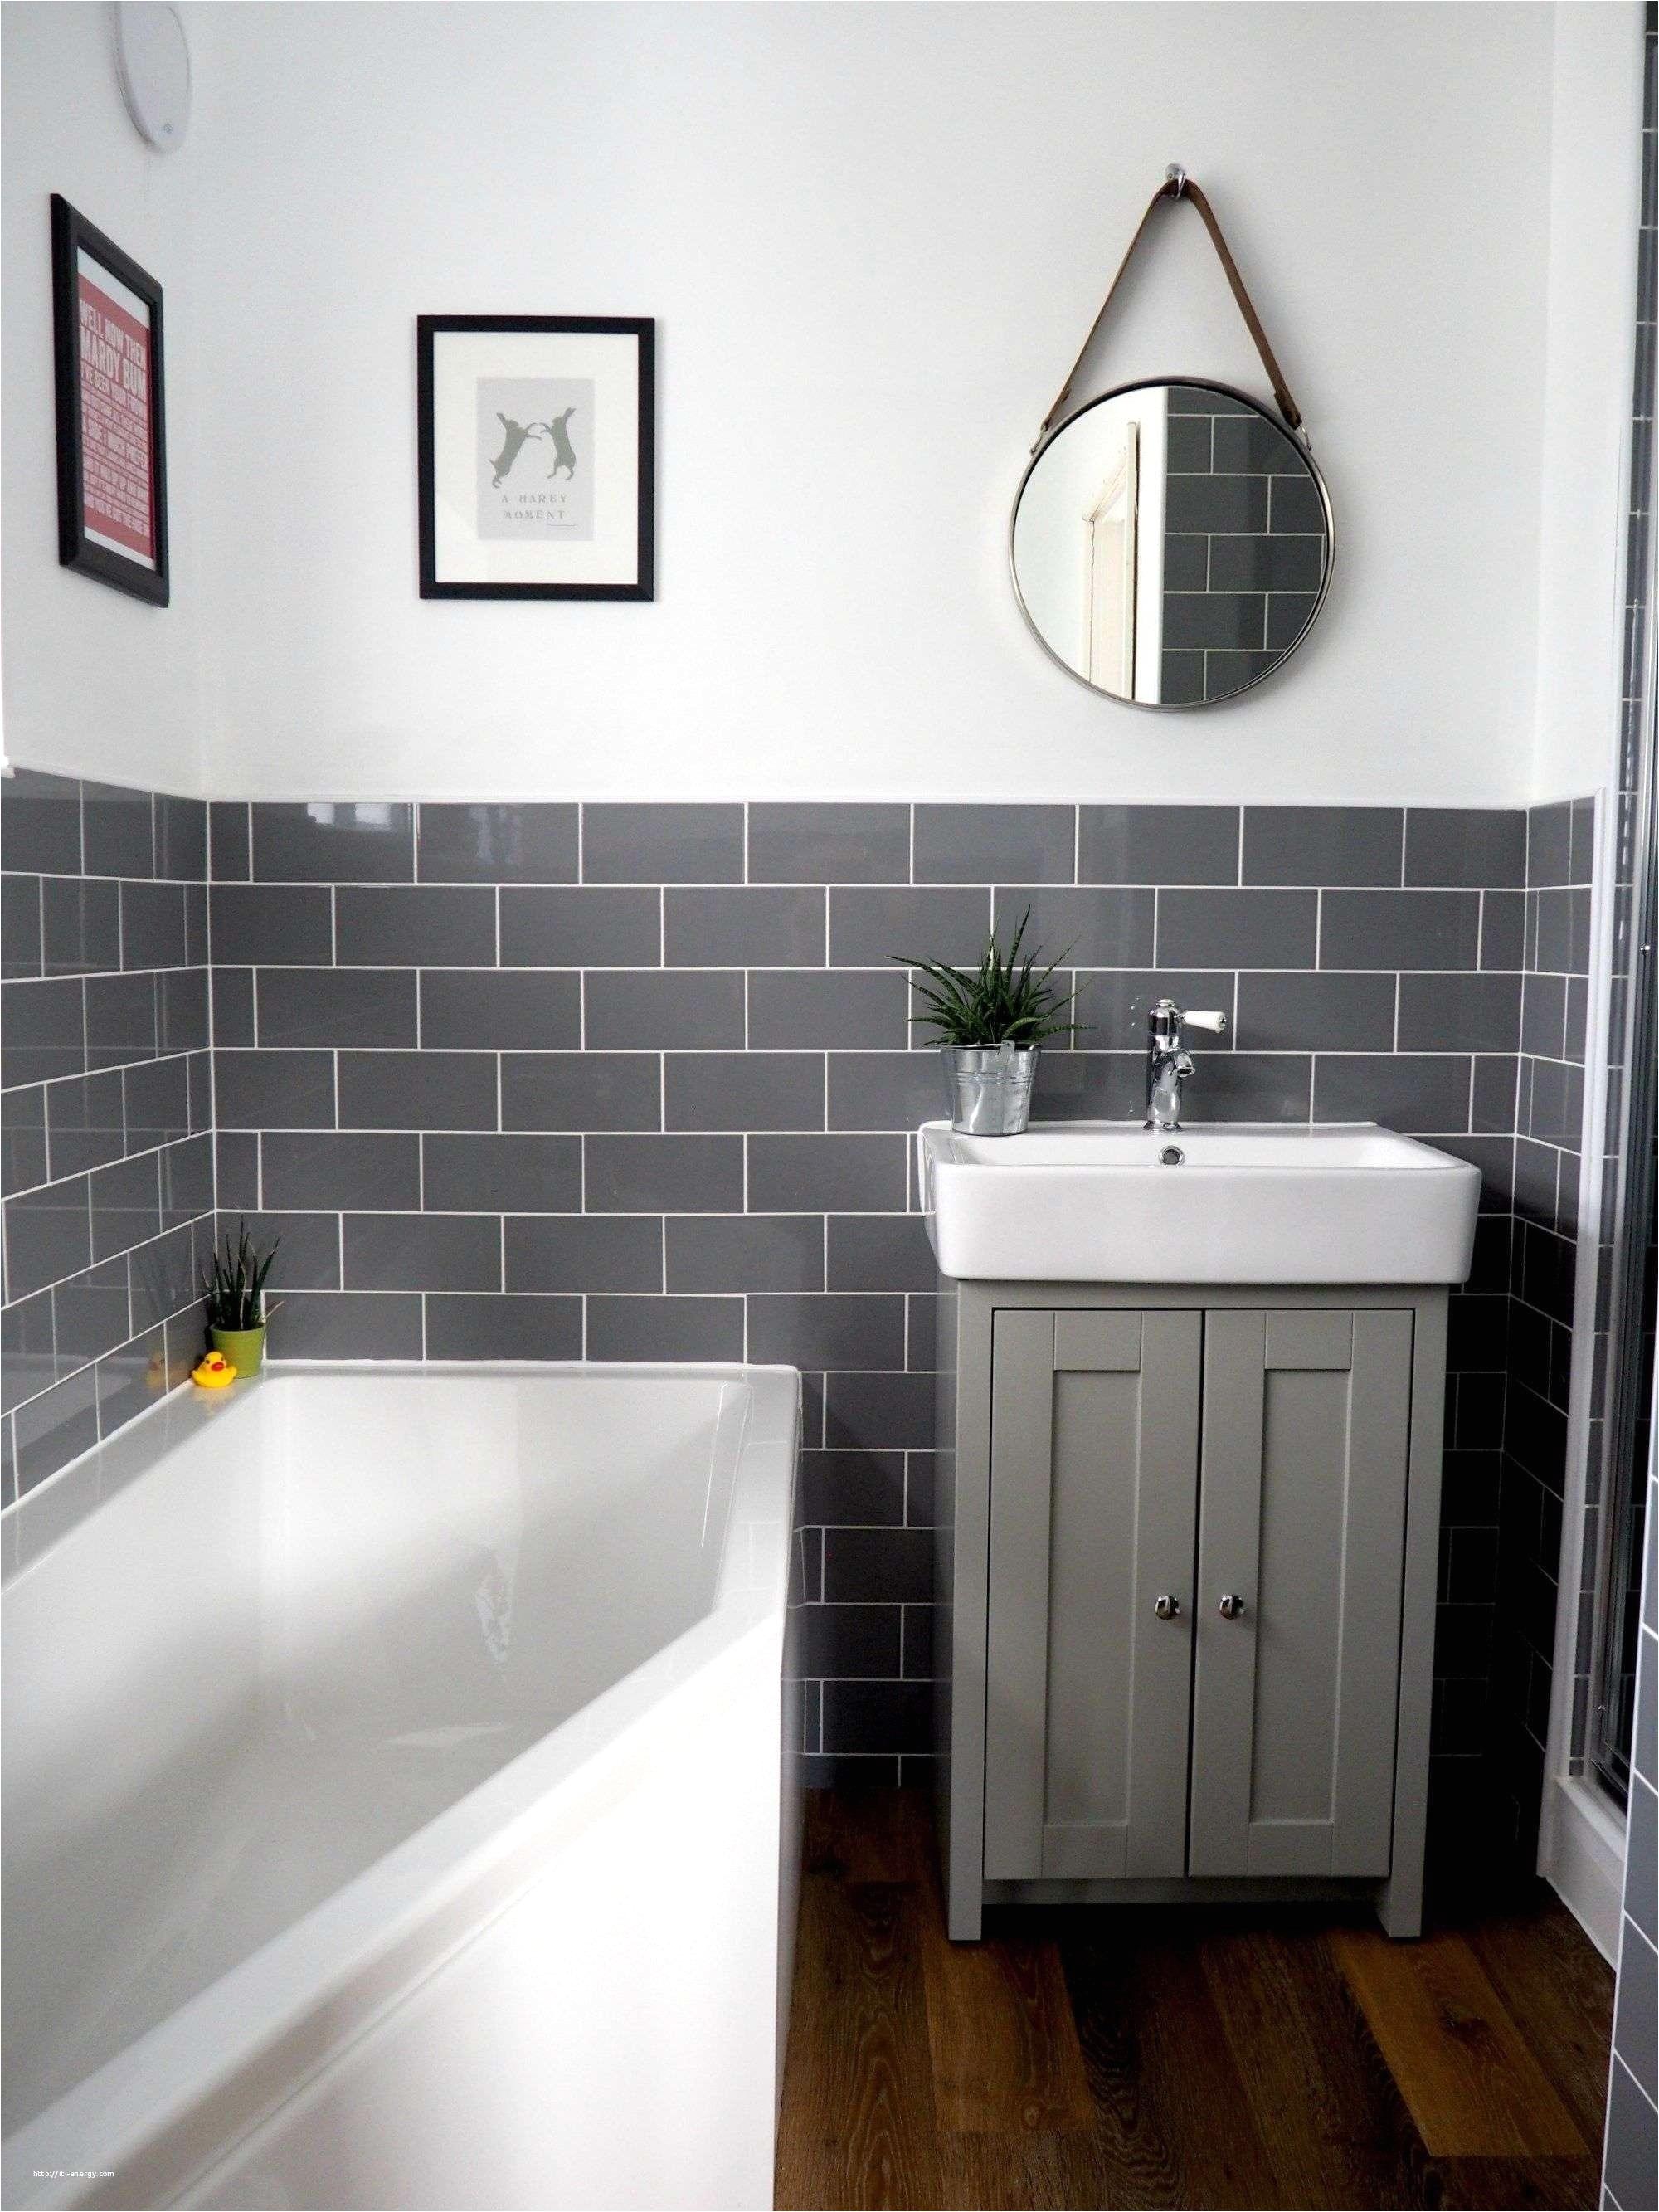 Luxury Bathroom Designs with Stunning Interior Good Bathroom 45 Modern Gray Bathroom Ideas Gray Bathroom 0d